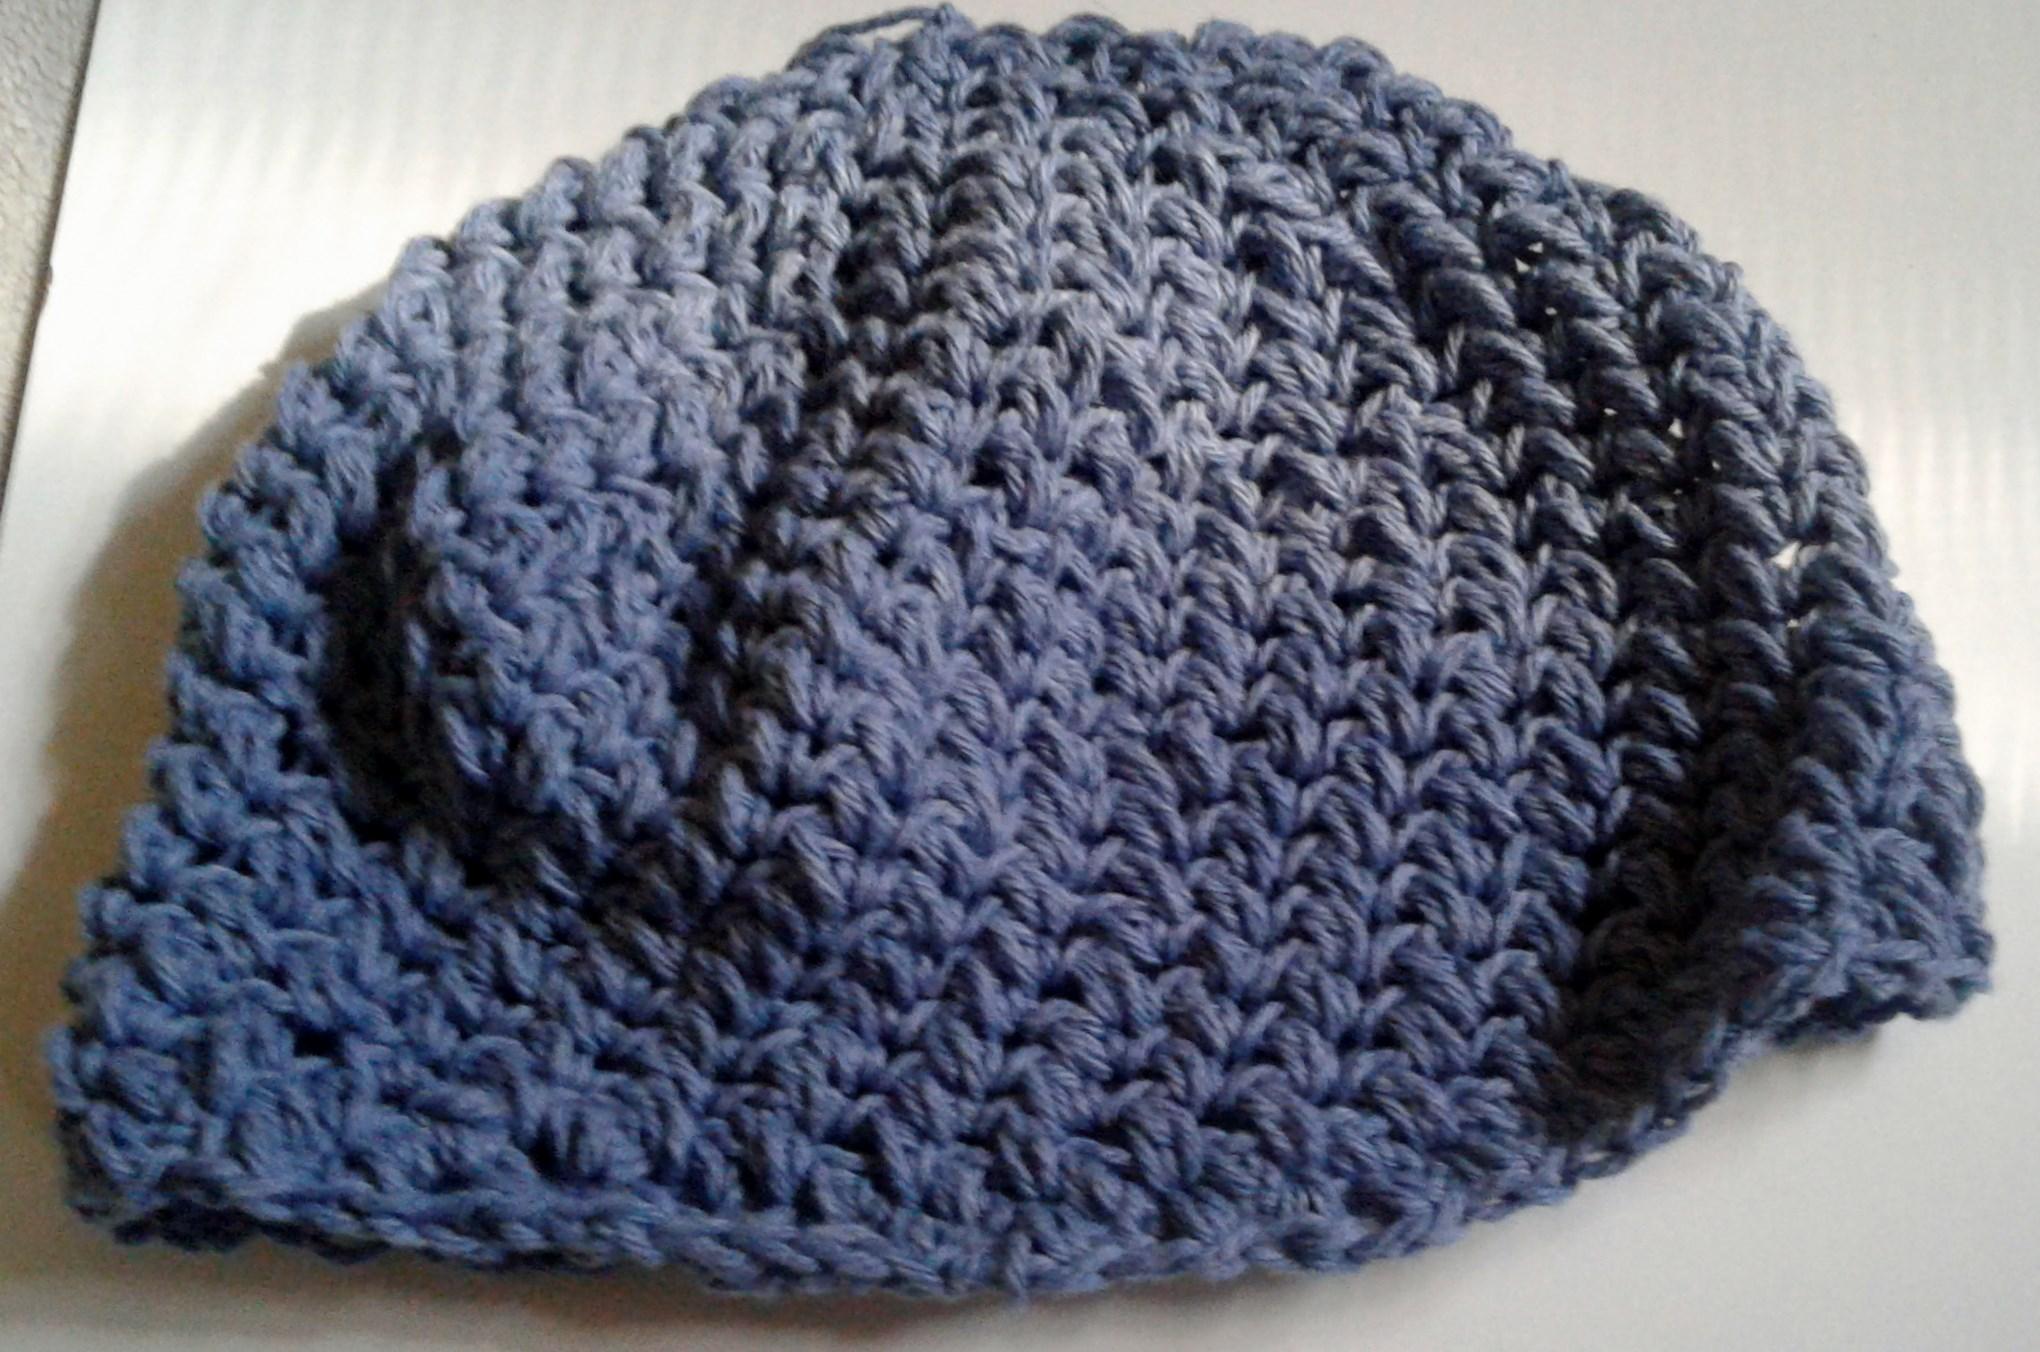 handmade blue spiral crochet beanie hat · kateejane s jewels ... b48f7c8744c